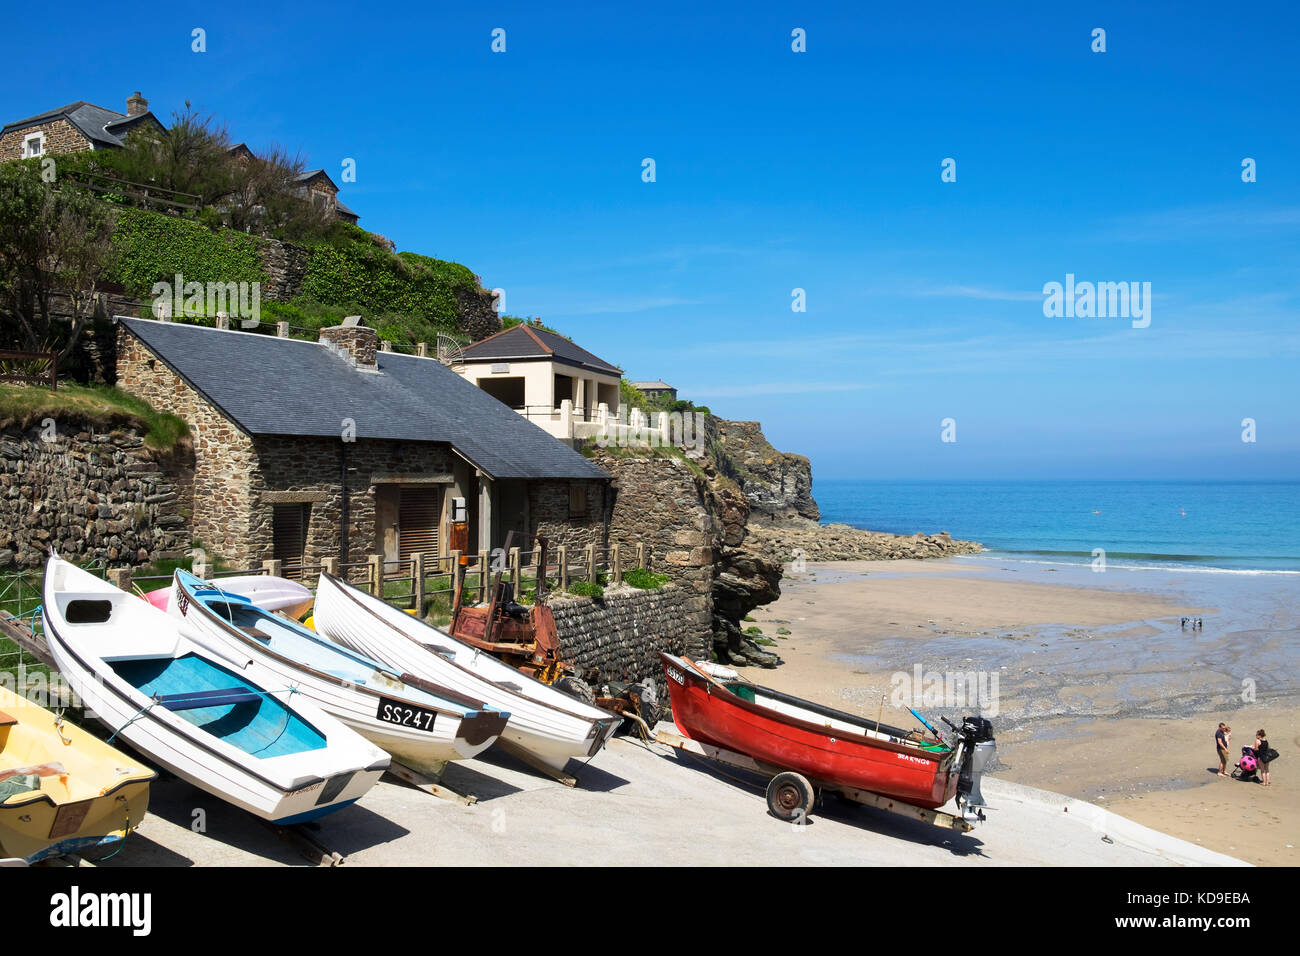 fishing boats on the slipway at trevaunance cove, st.agnes, cornwall, england, uk. - Stock Image